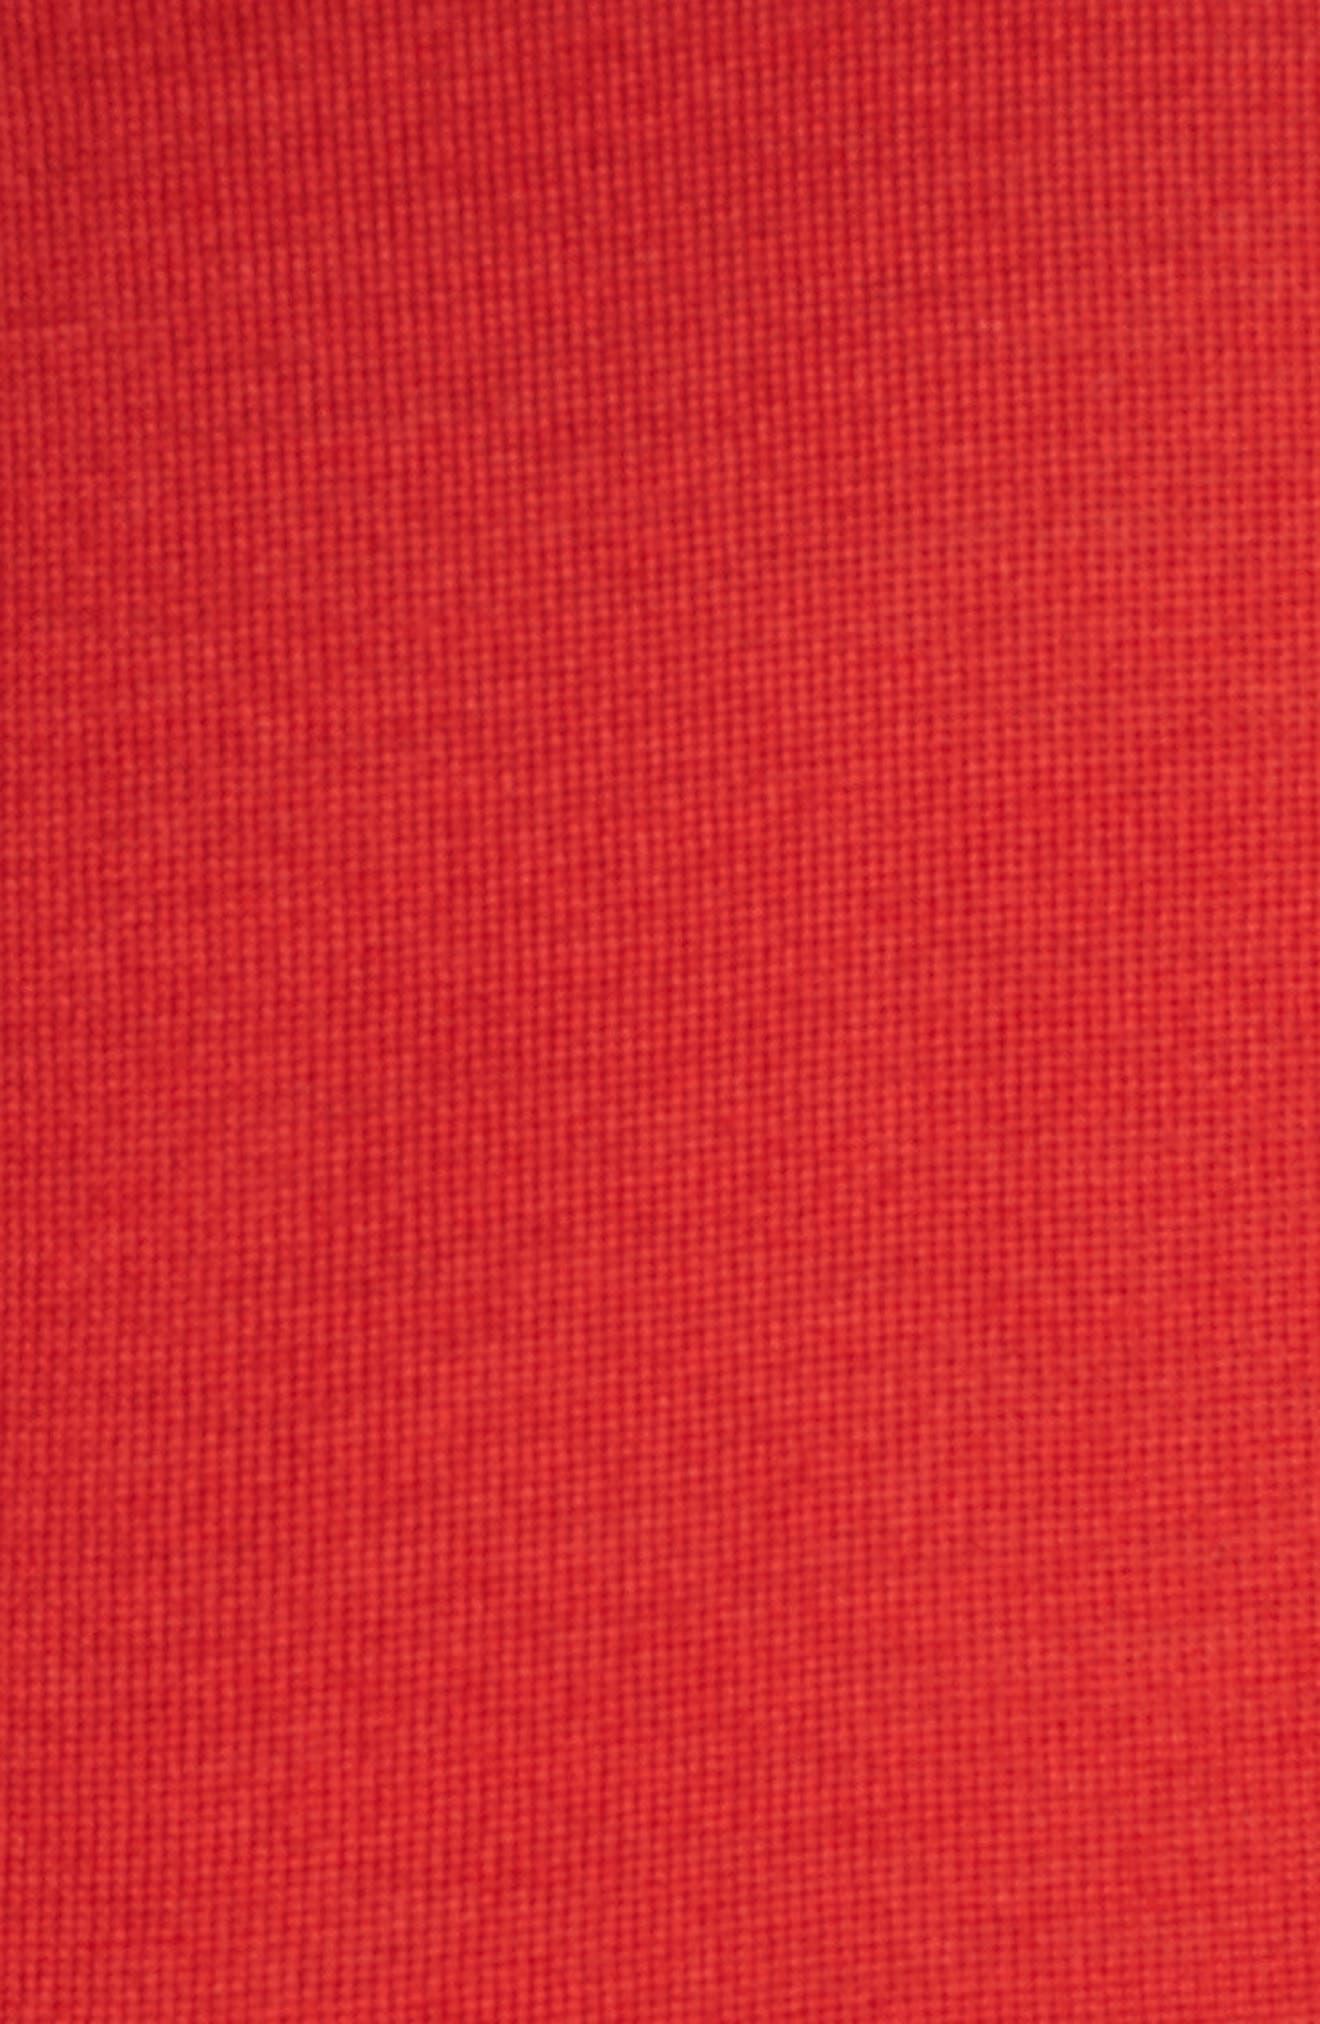 Fuyuka Wool Sweater,                             Alternate thumbnail 5, color,                             Crimson Red